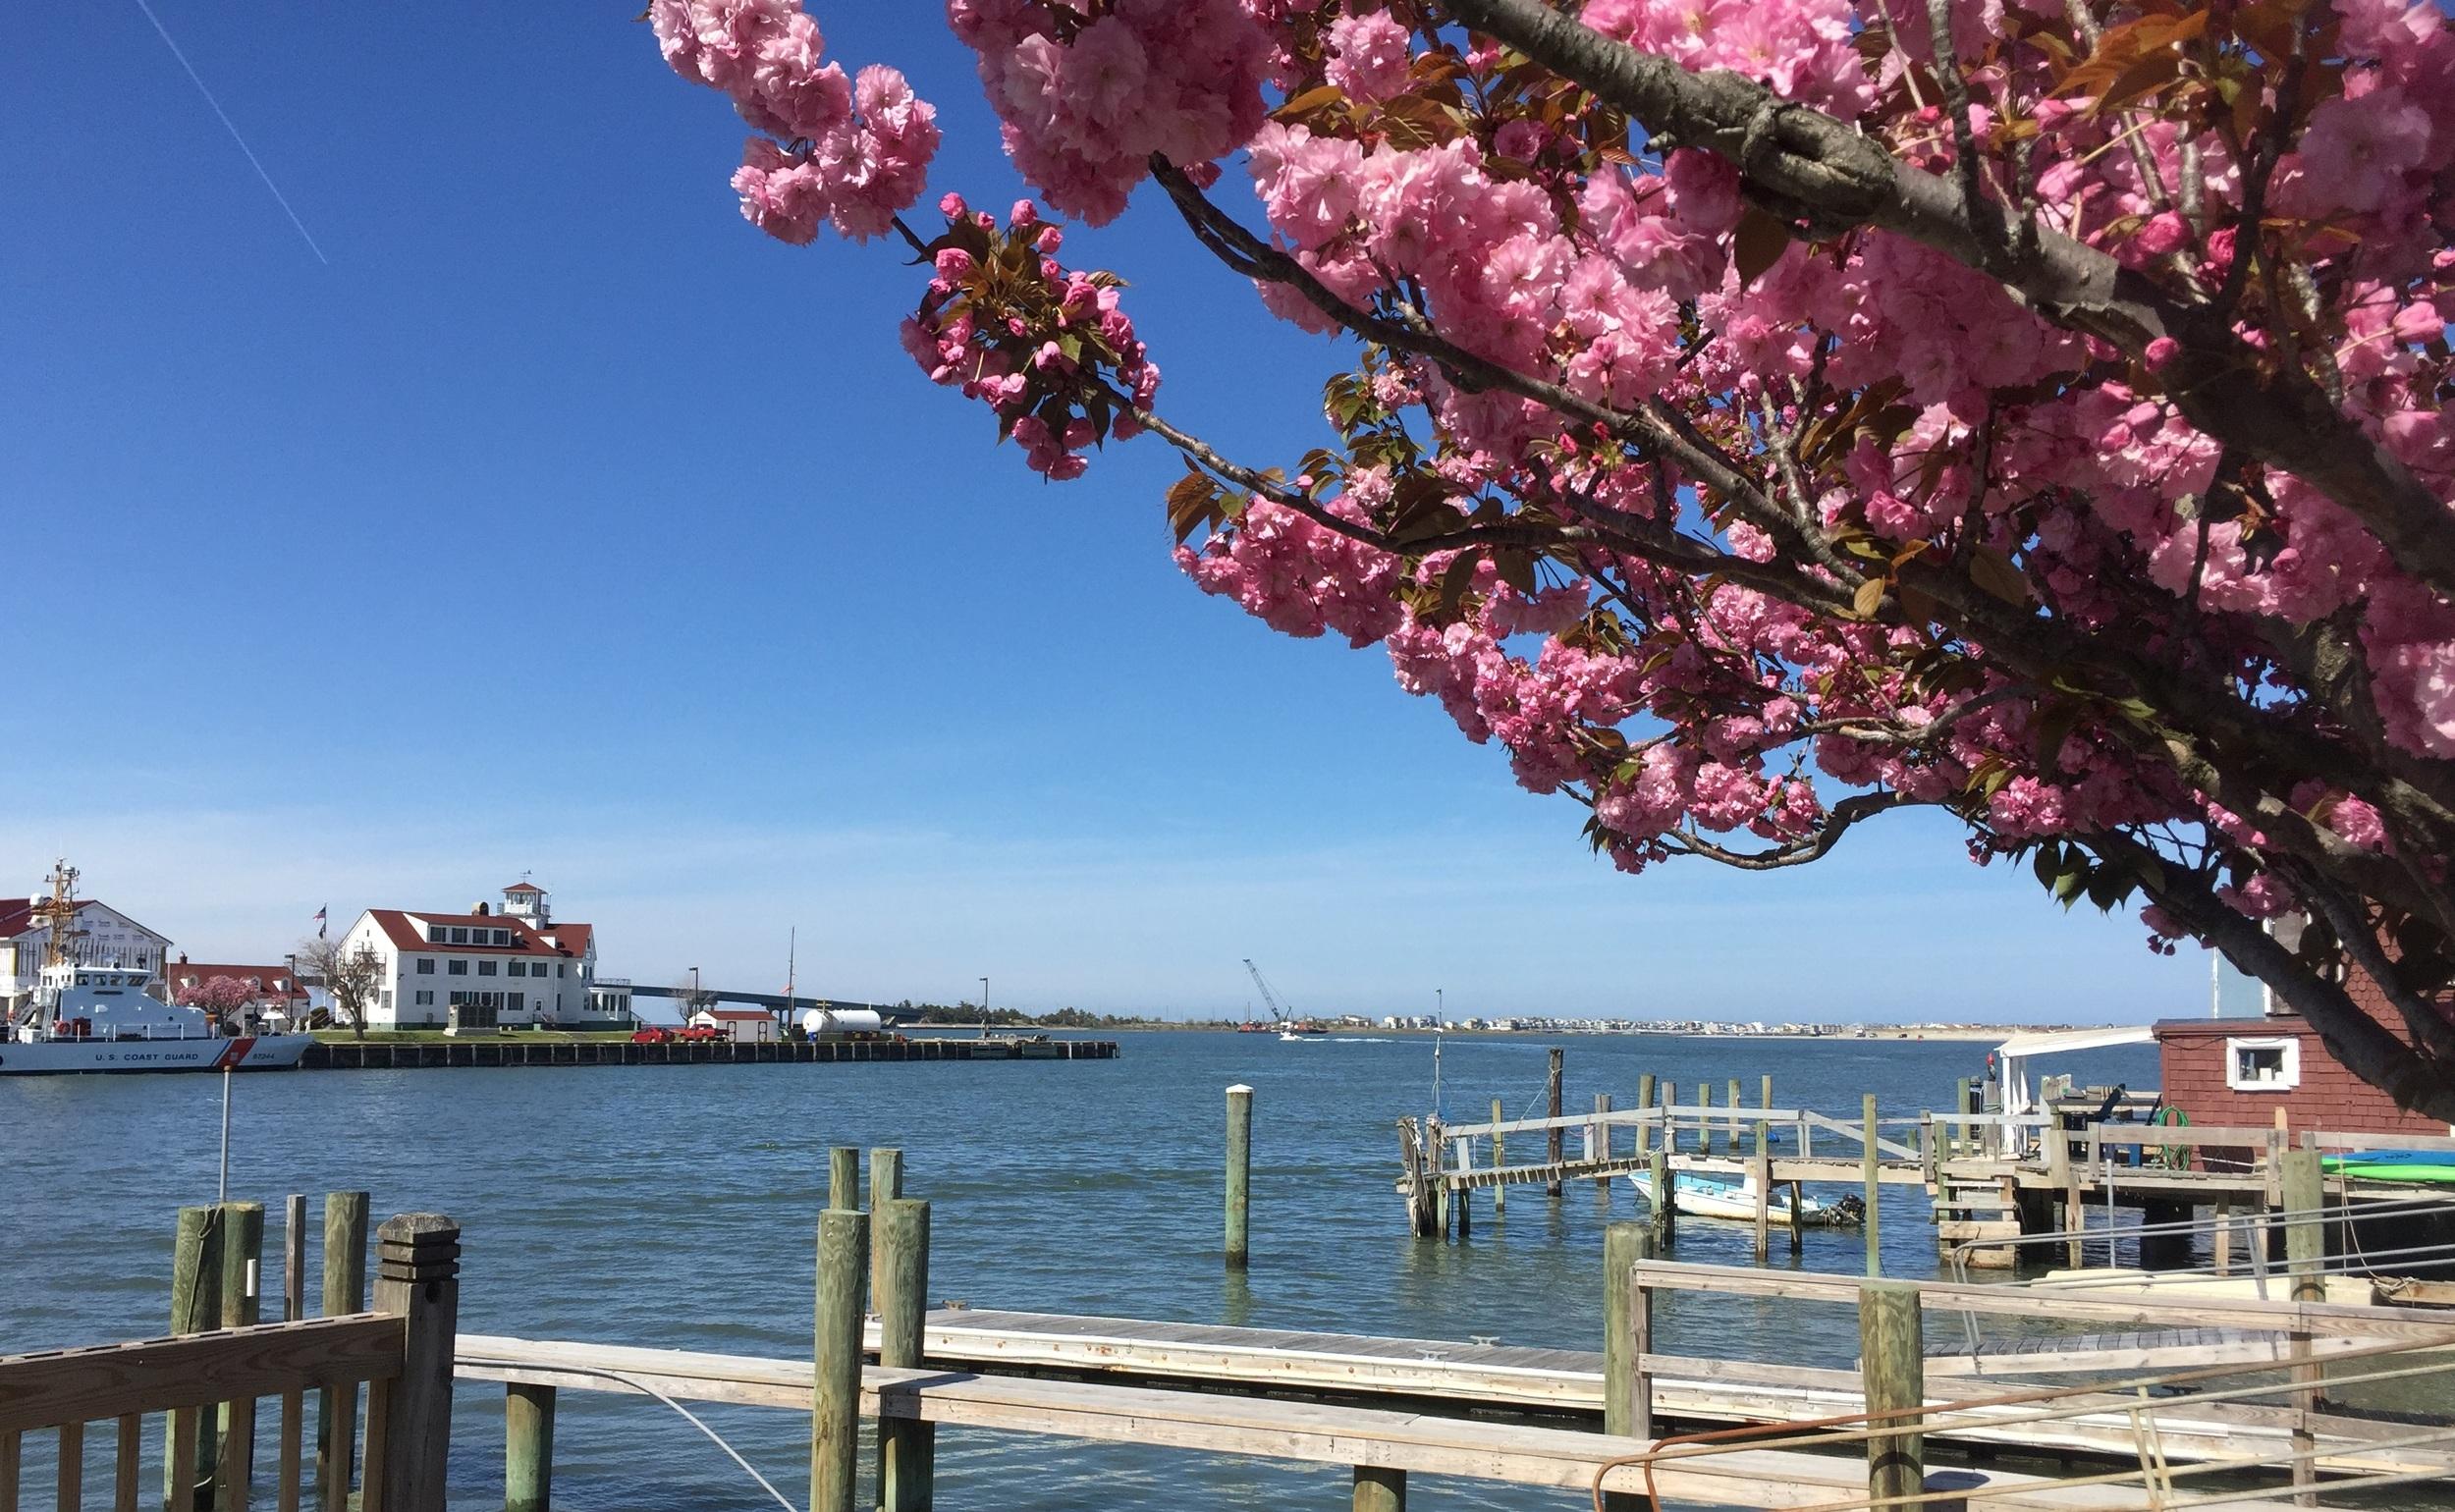 Kammerman's Marina in Atlantic City, NJ